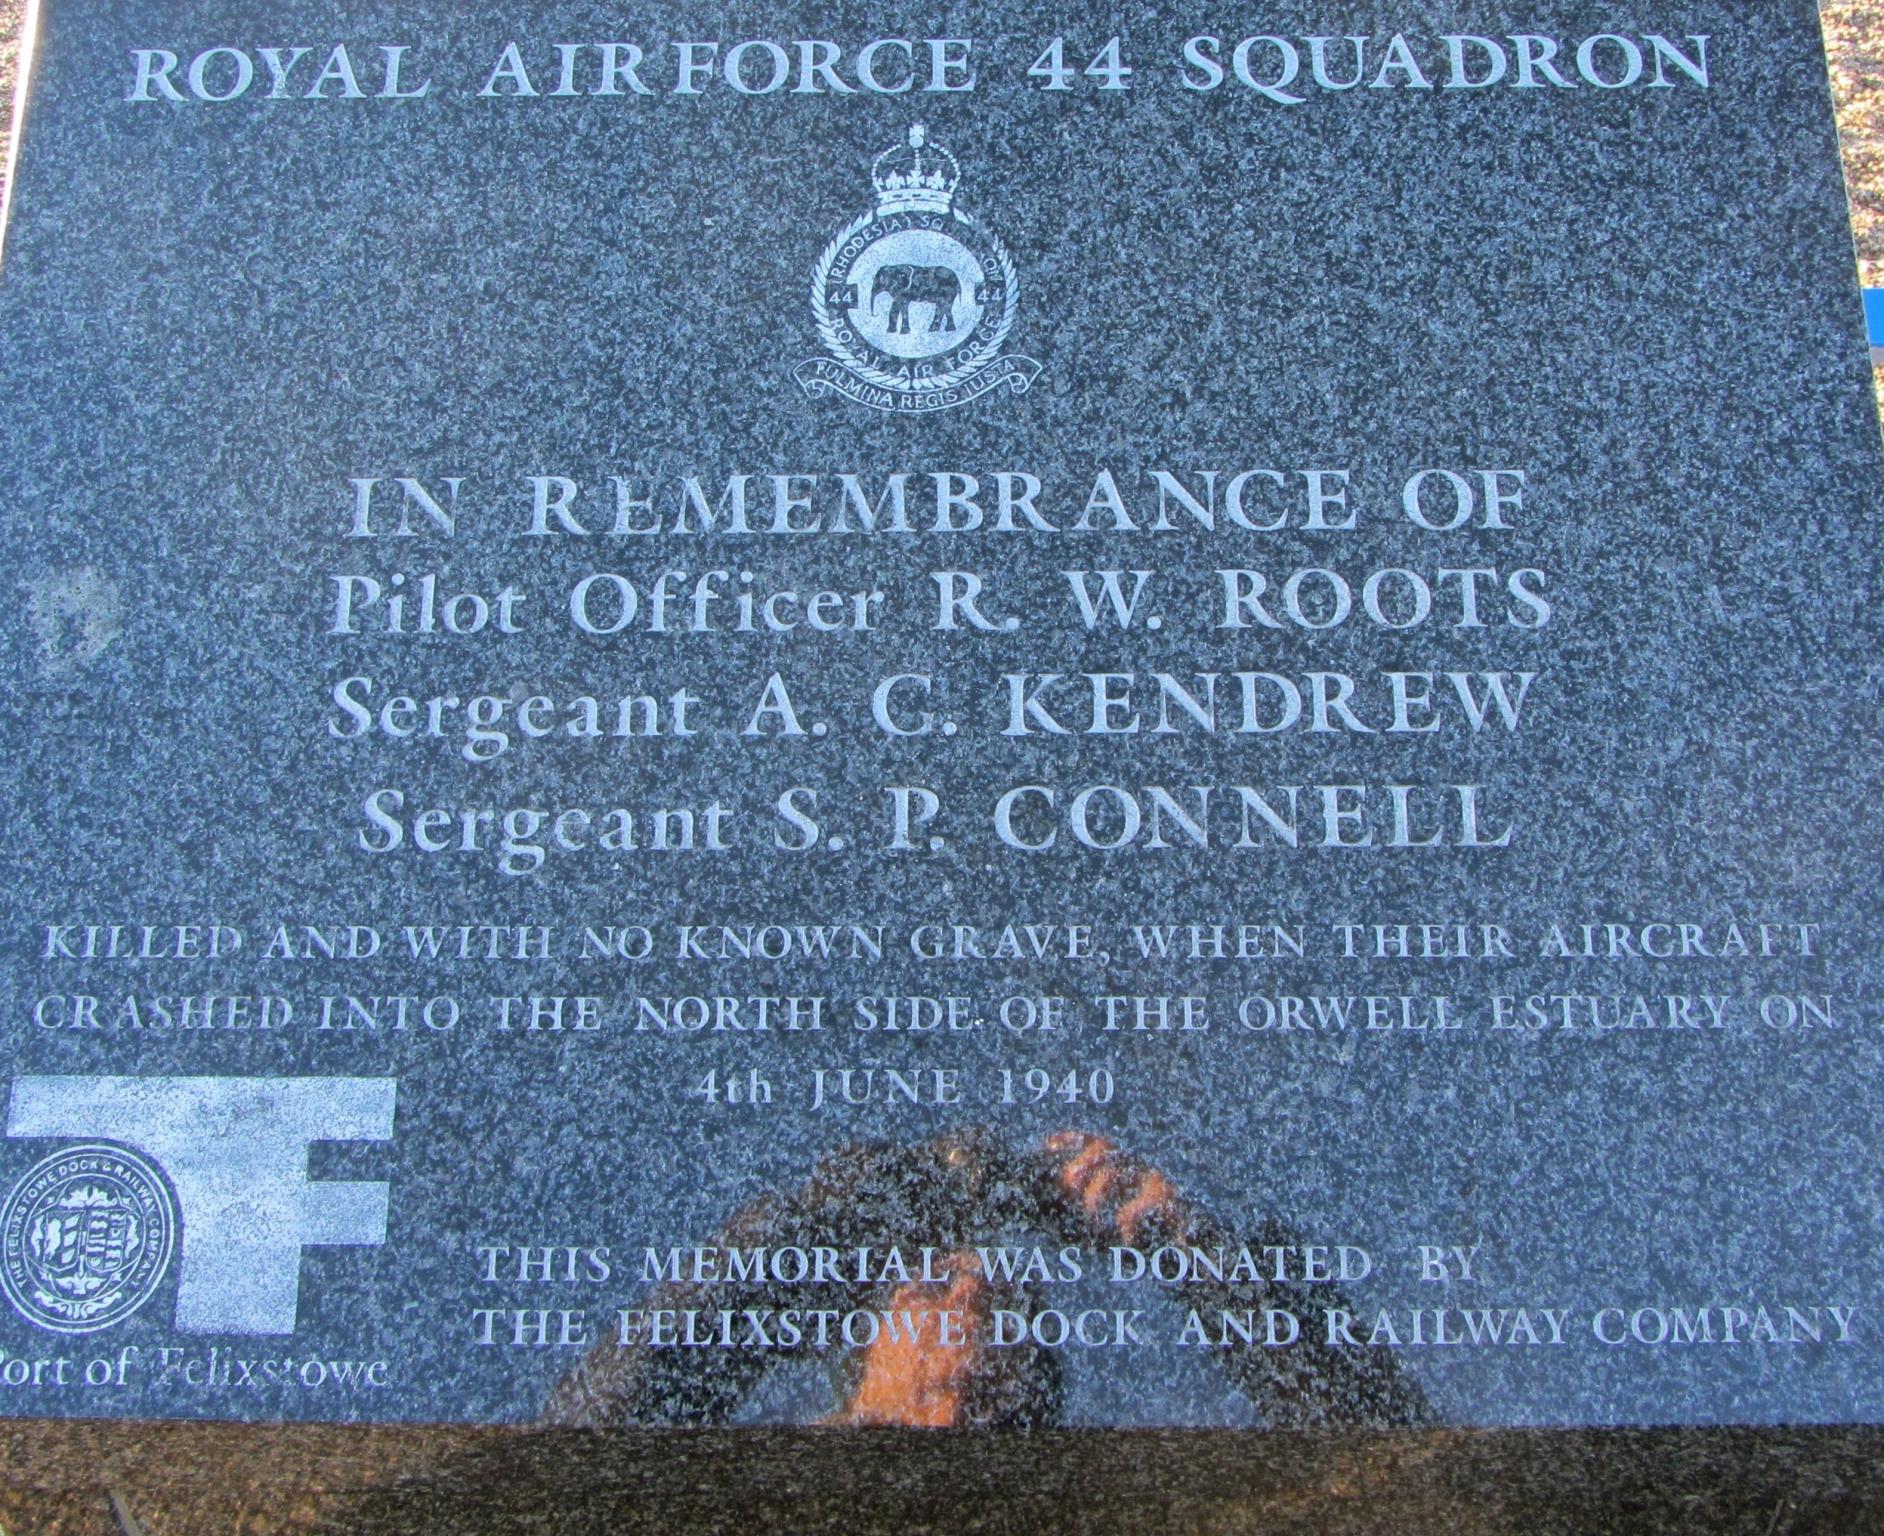 Royal Air Force Squadron 44 - War Memorials Online